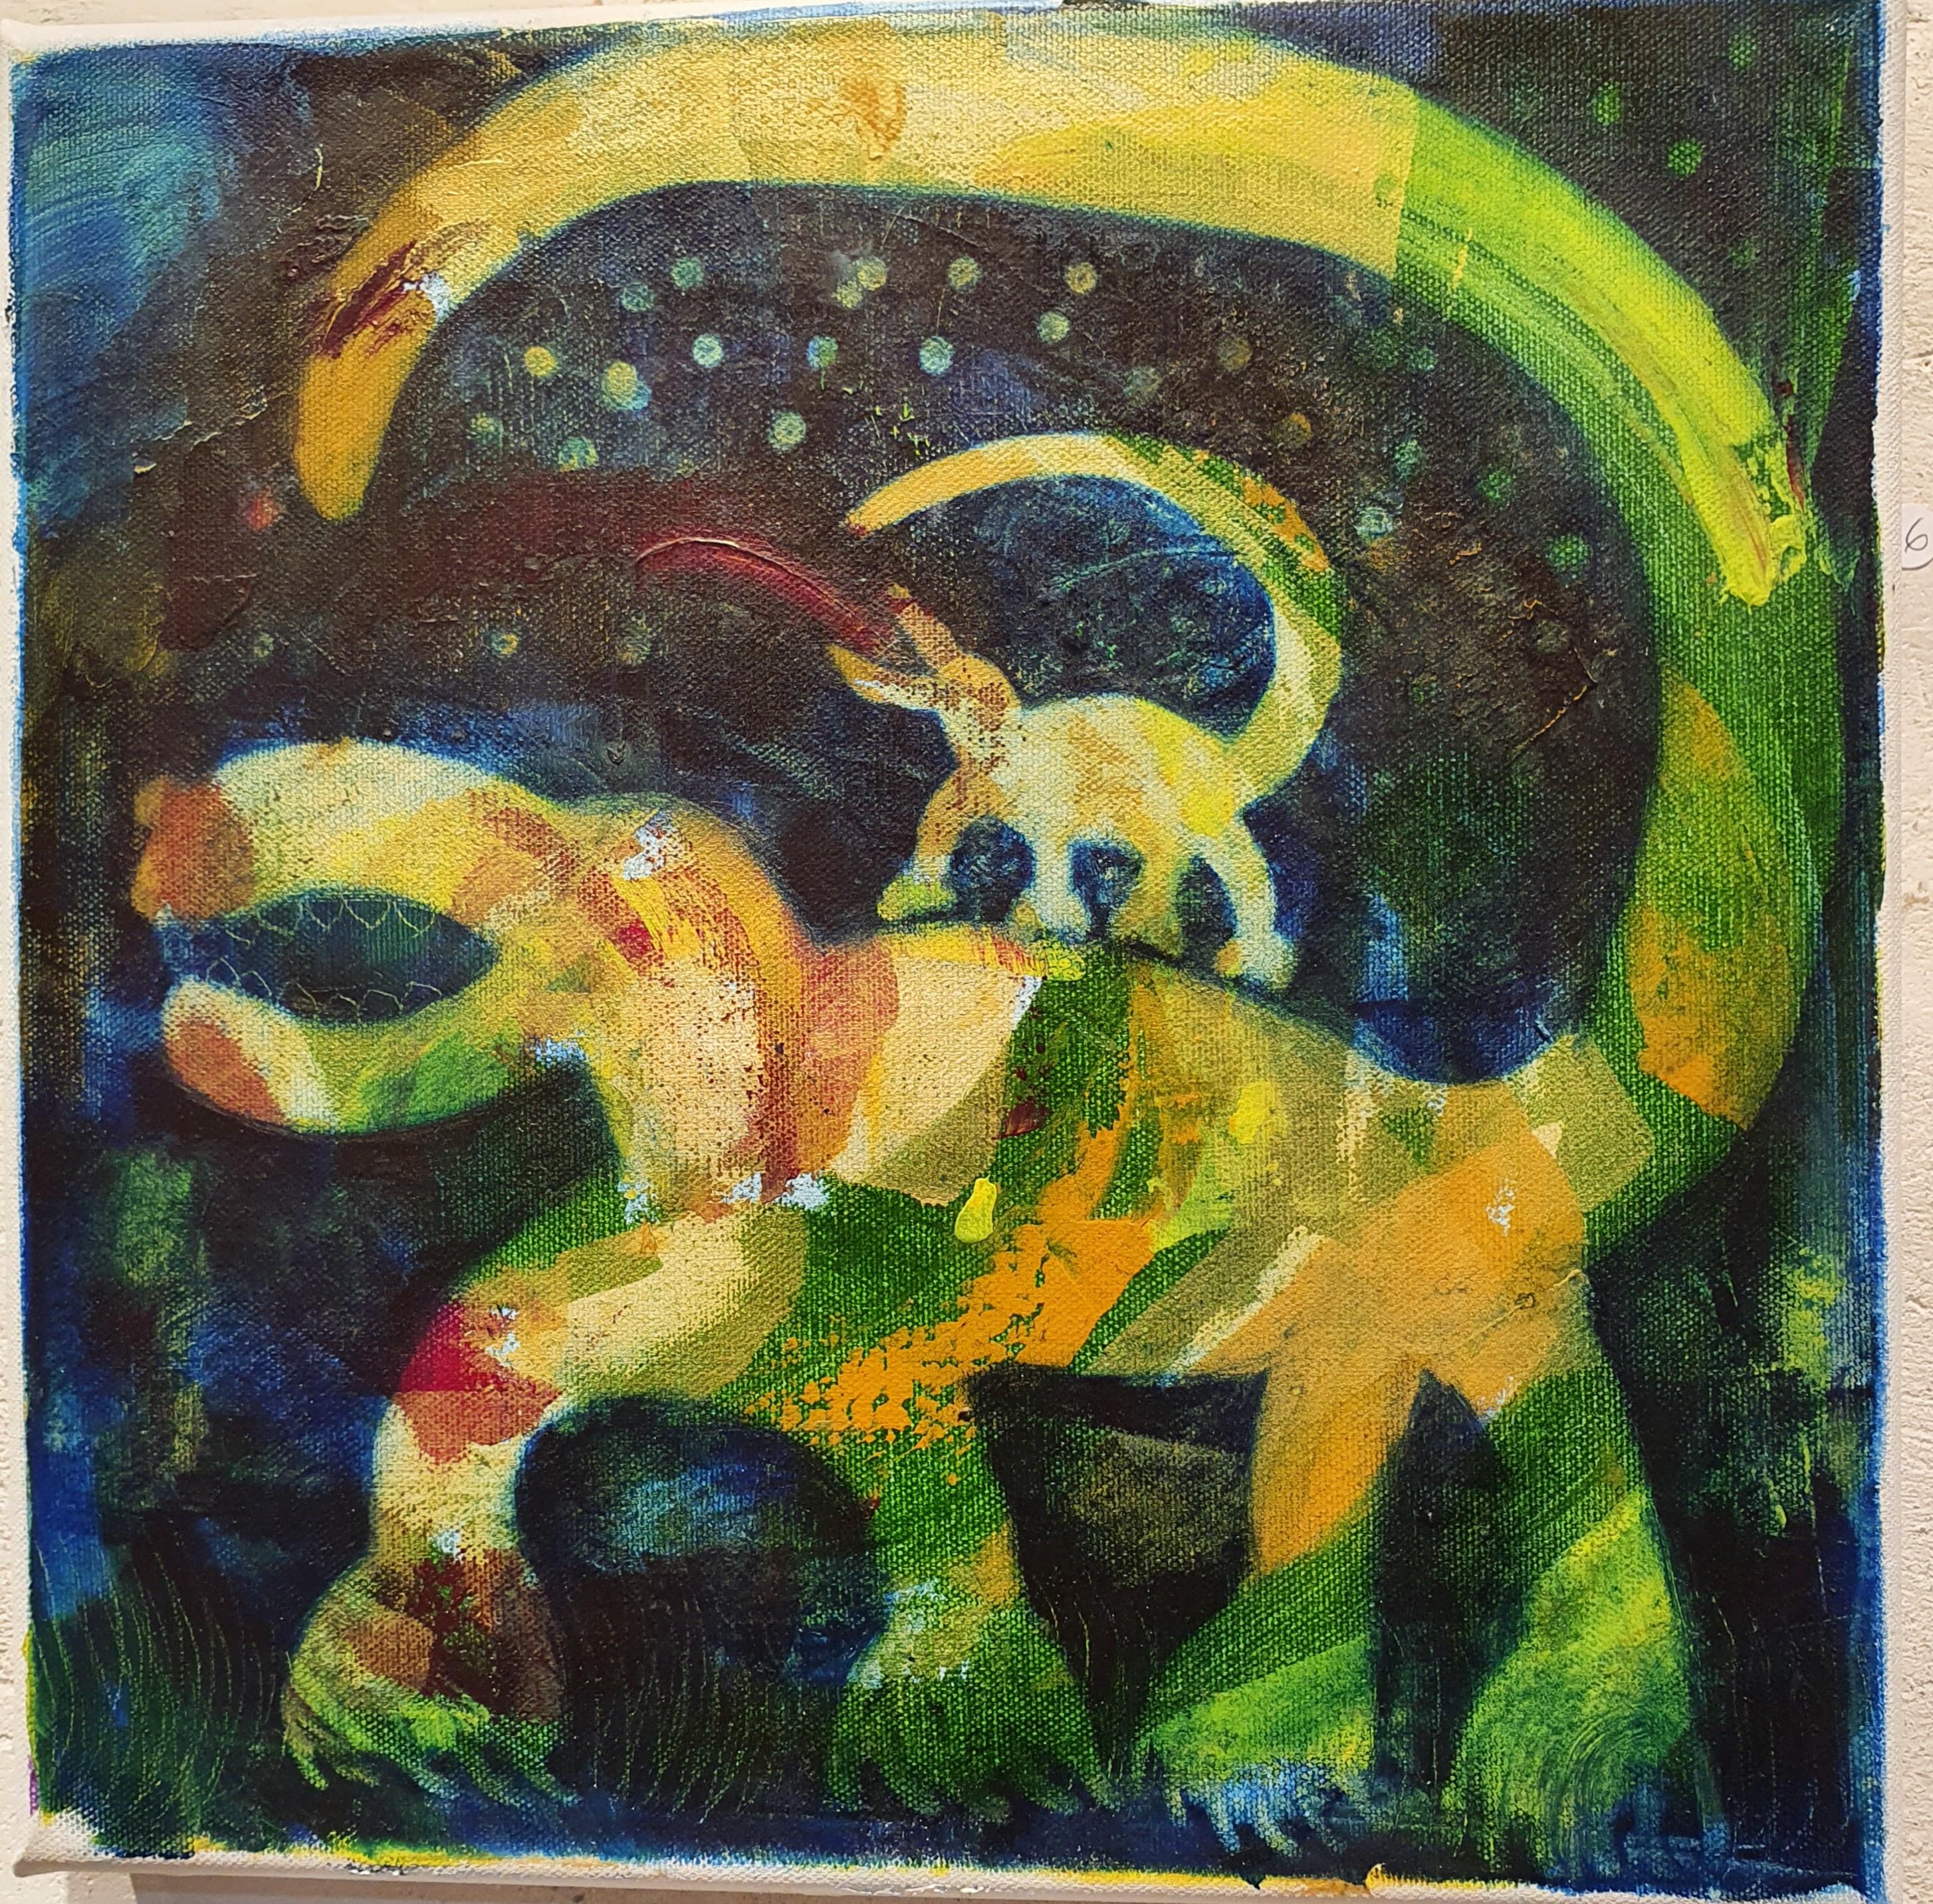 Saurus med tuff babysaurus